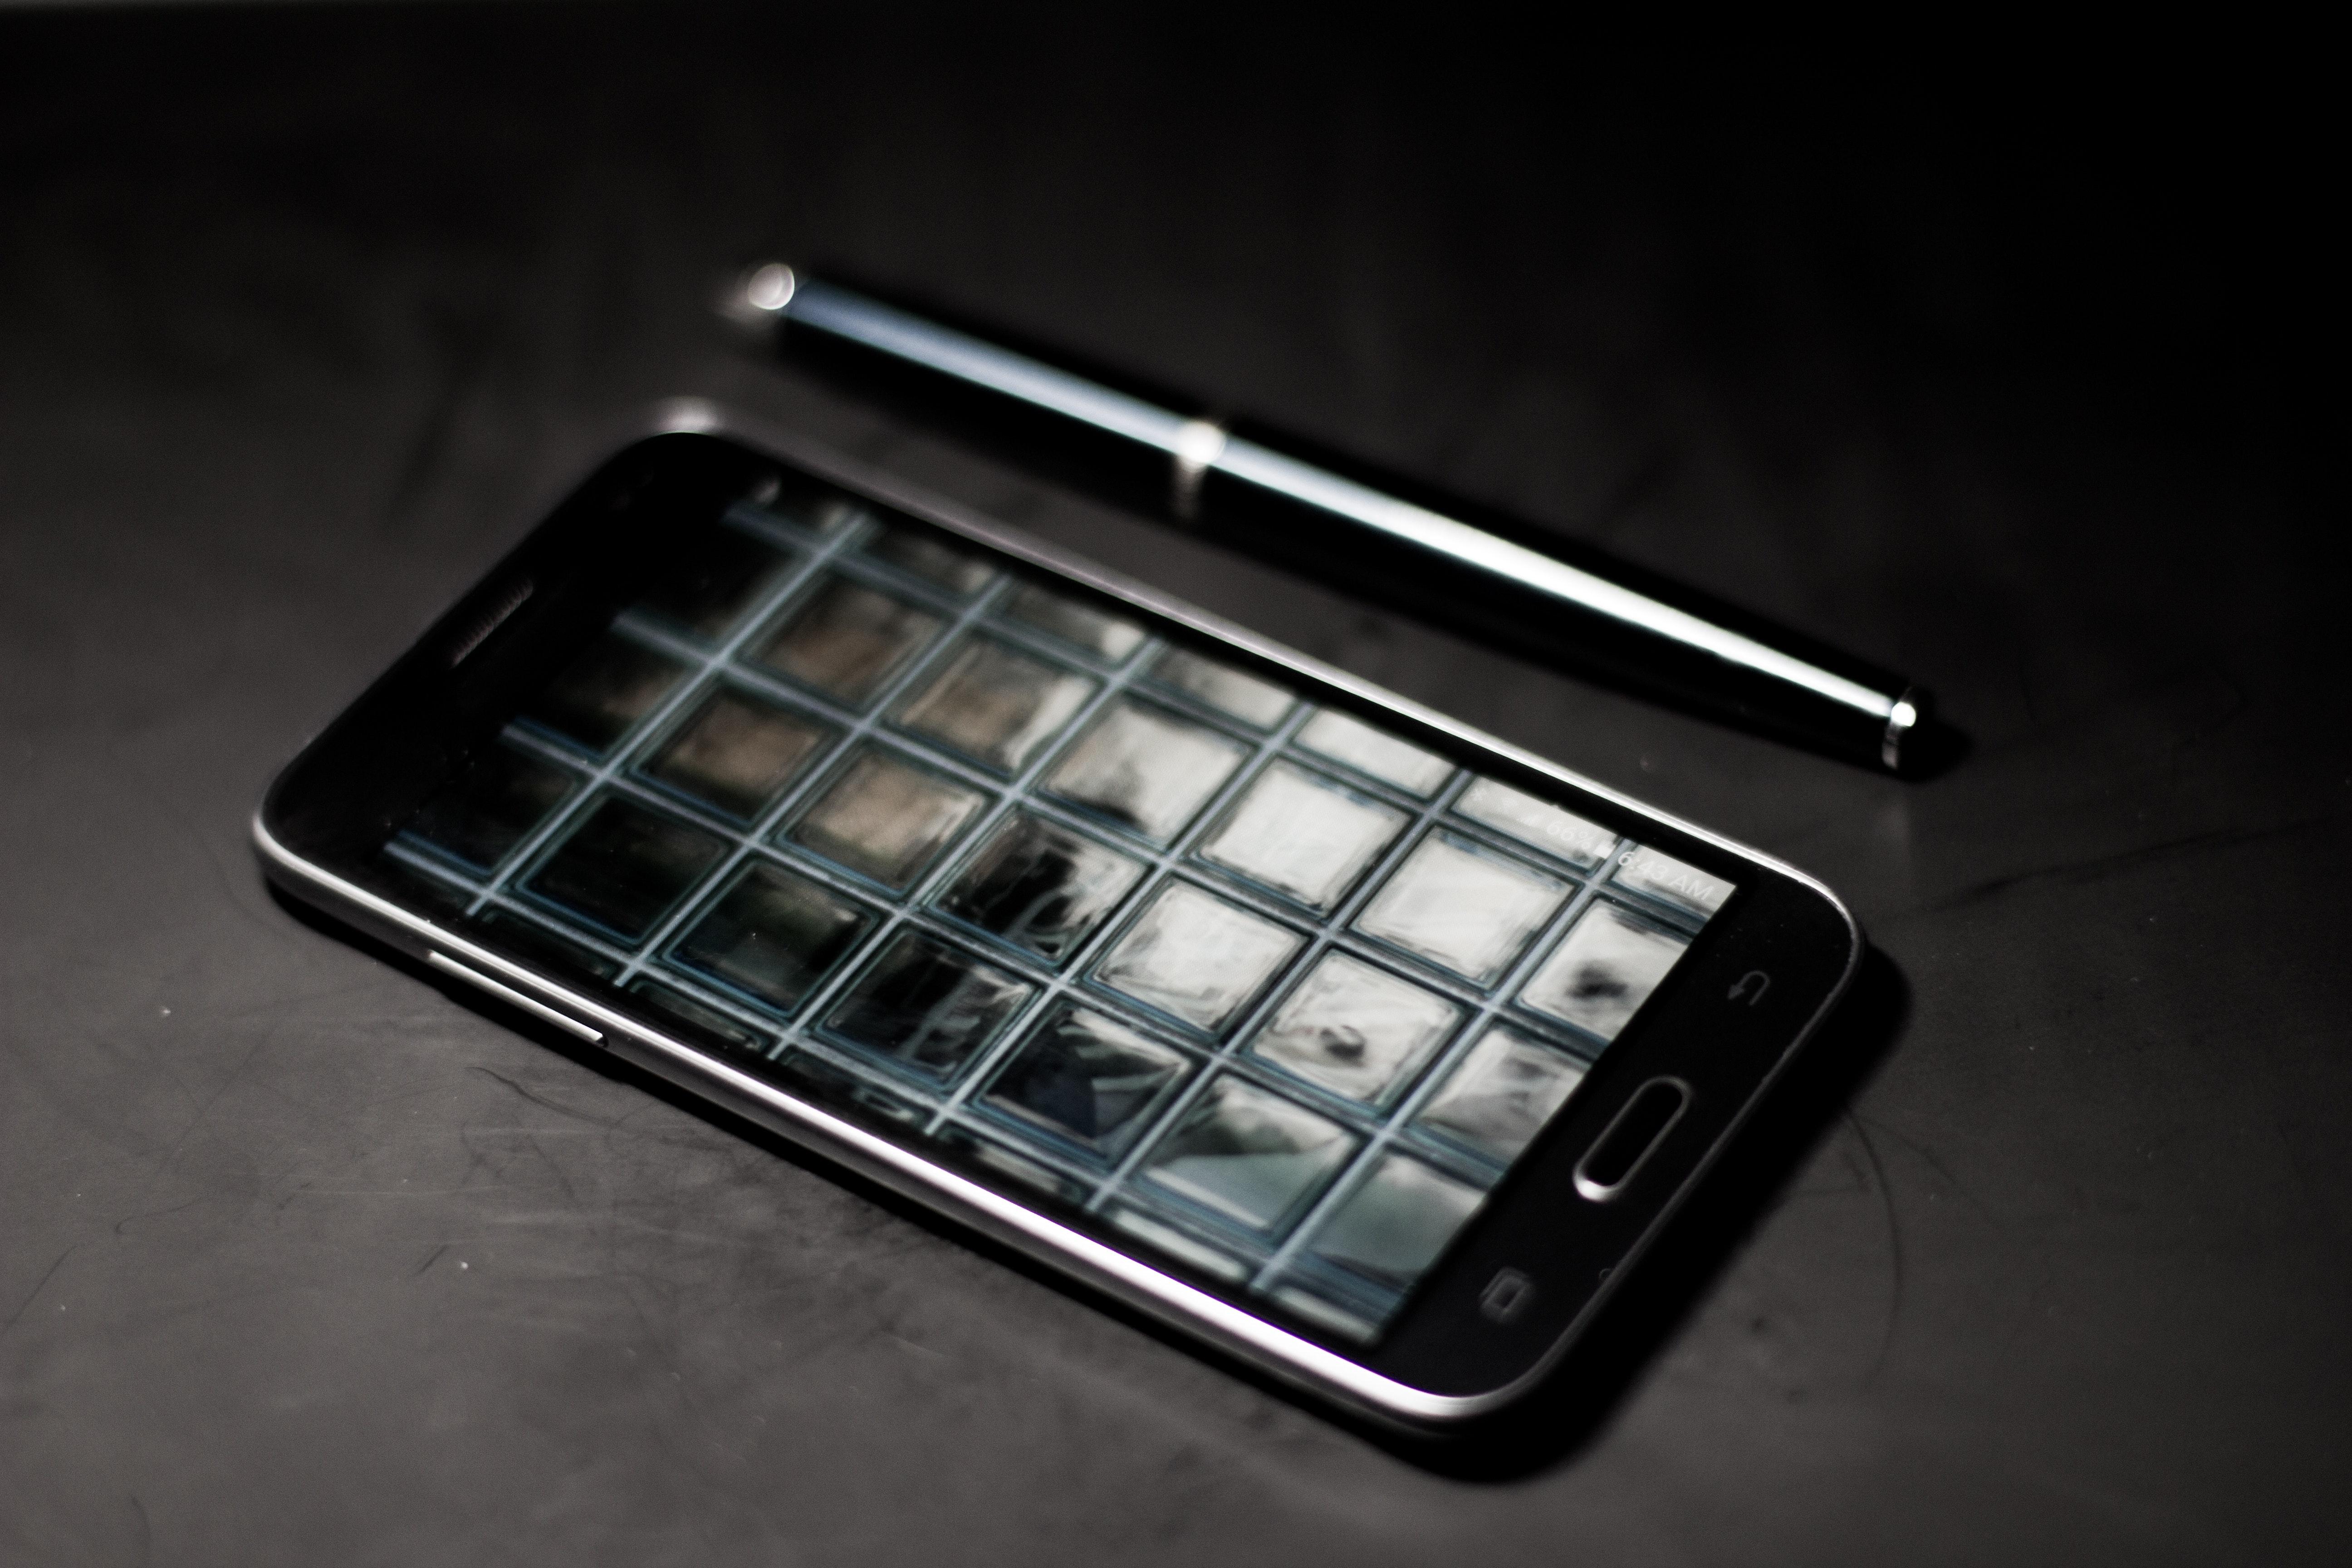 Black samsung android smartphone photo